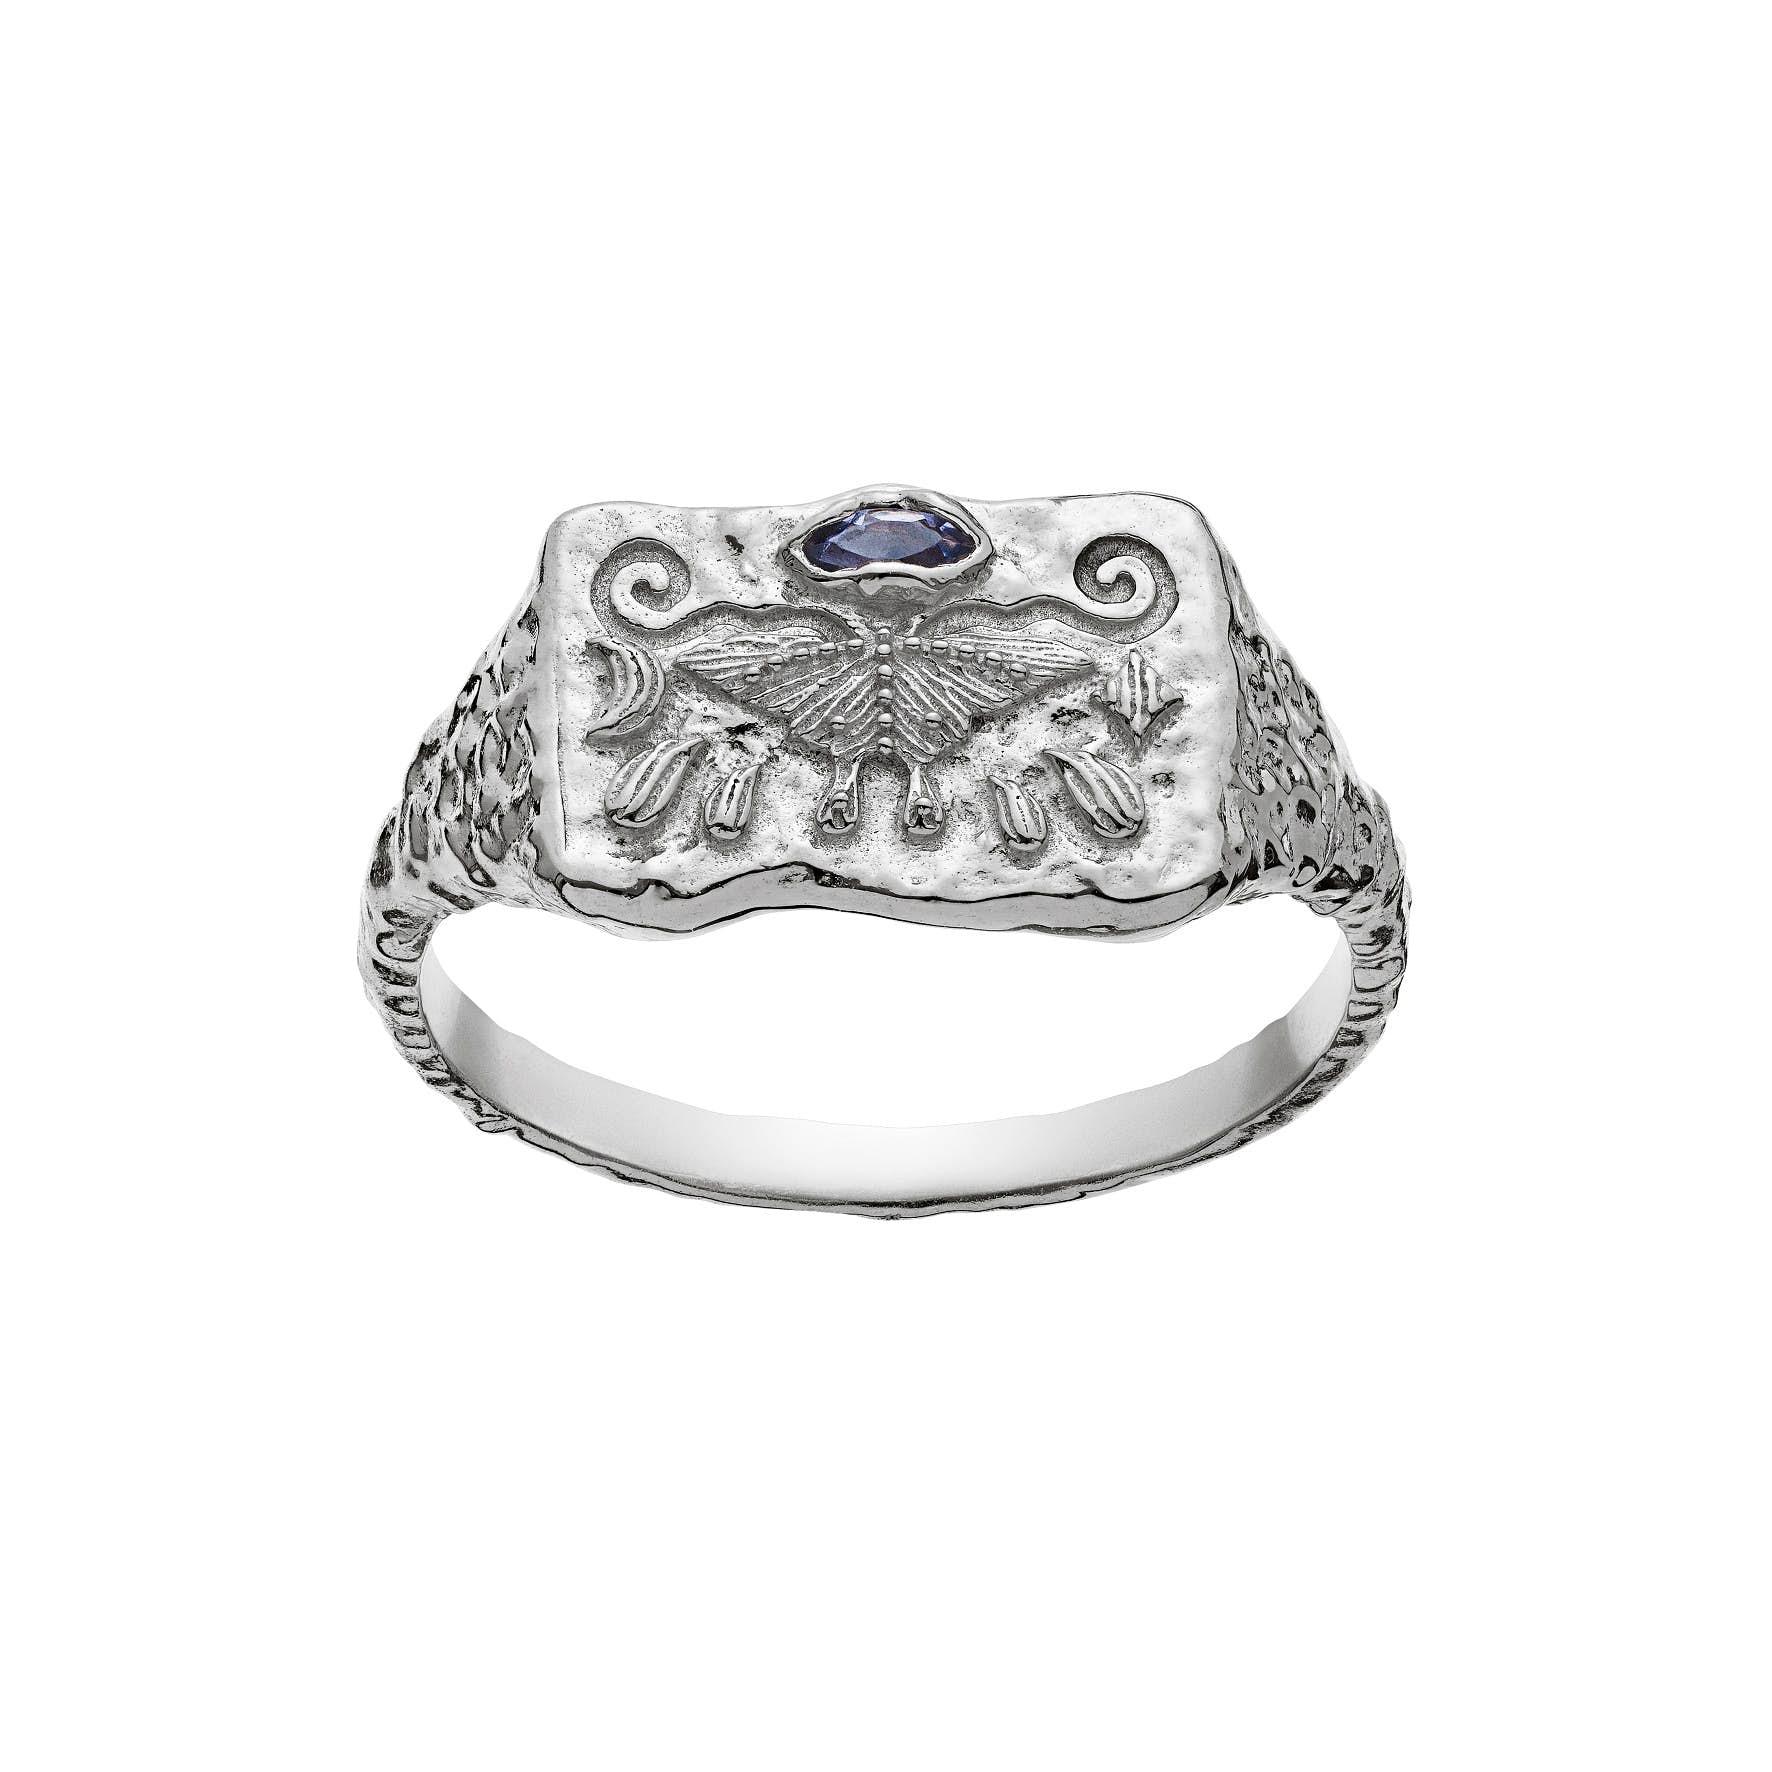 Gry Ring von Maanesten in Silber Sterling 925